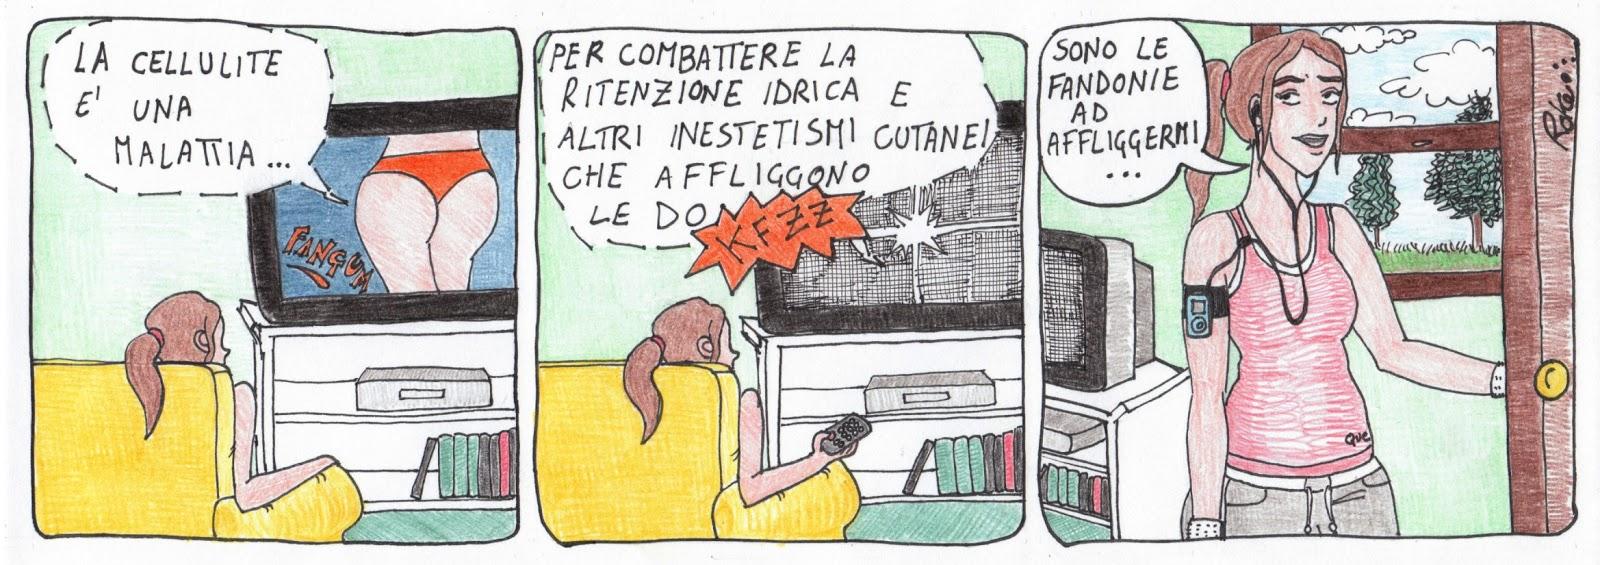 cellulite cure ritenzione idrica fandonie vignetta